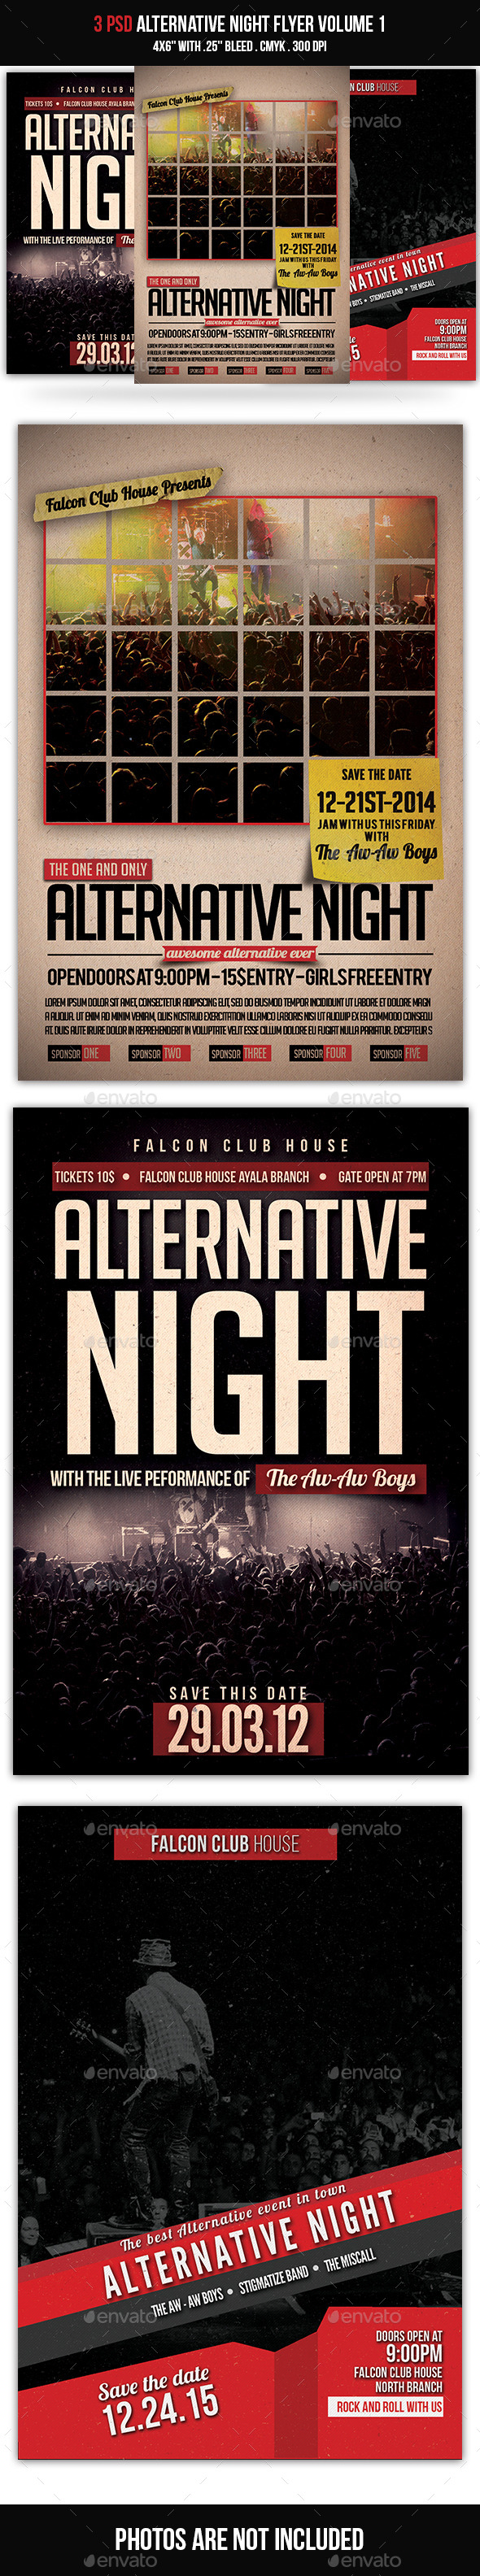 Alternative Night Bundle Volume 1 - Events Flyers